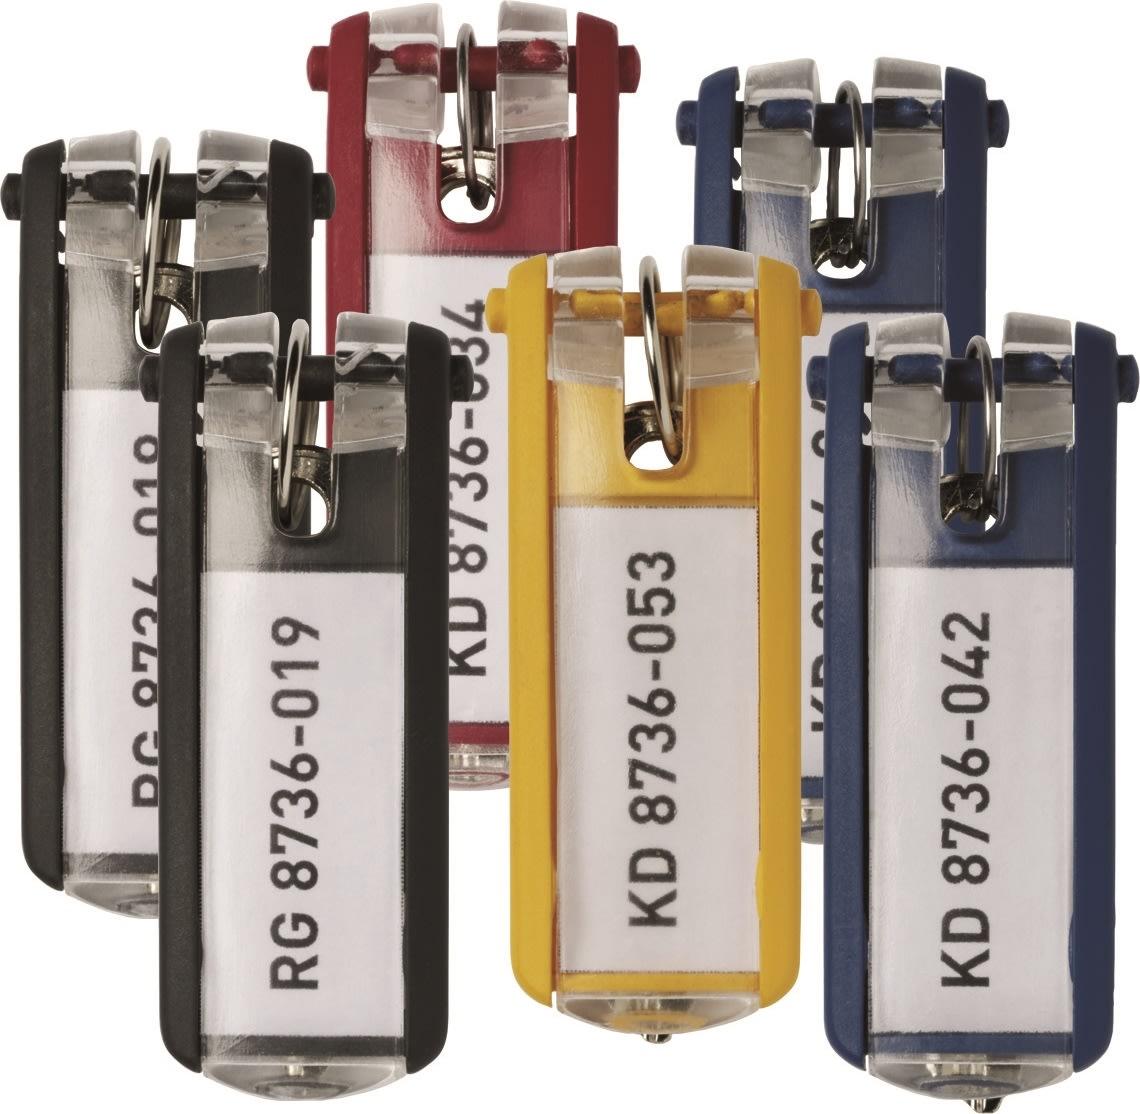 Durable Key Clip Nøglering/brik, 6 stk., ass.